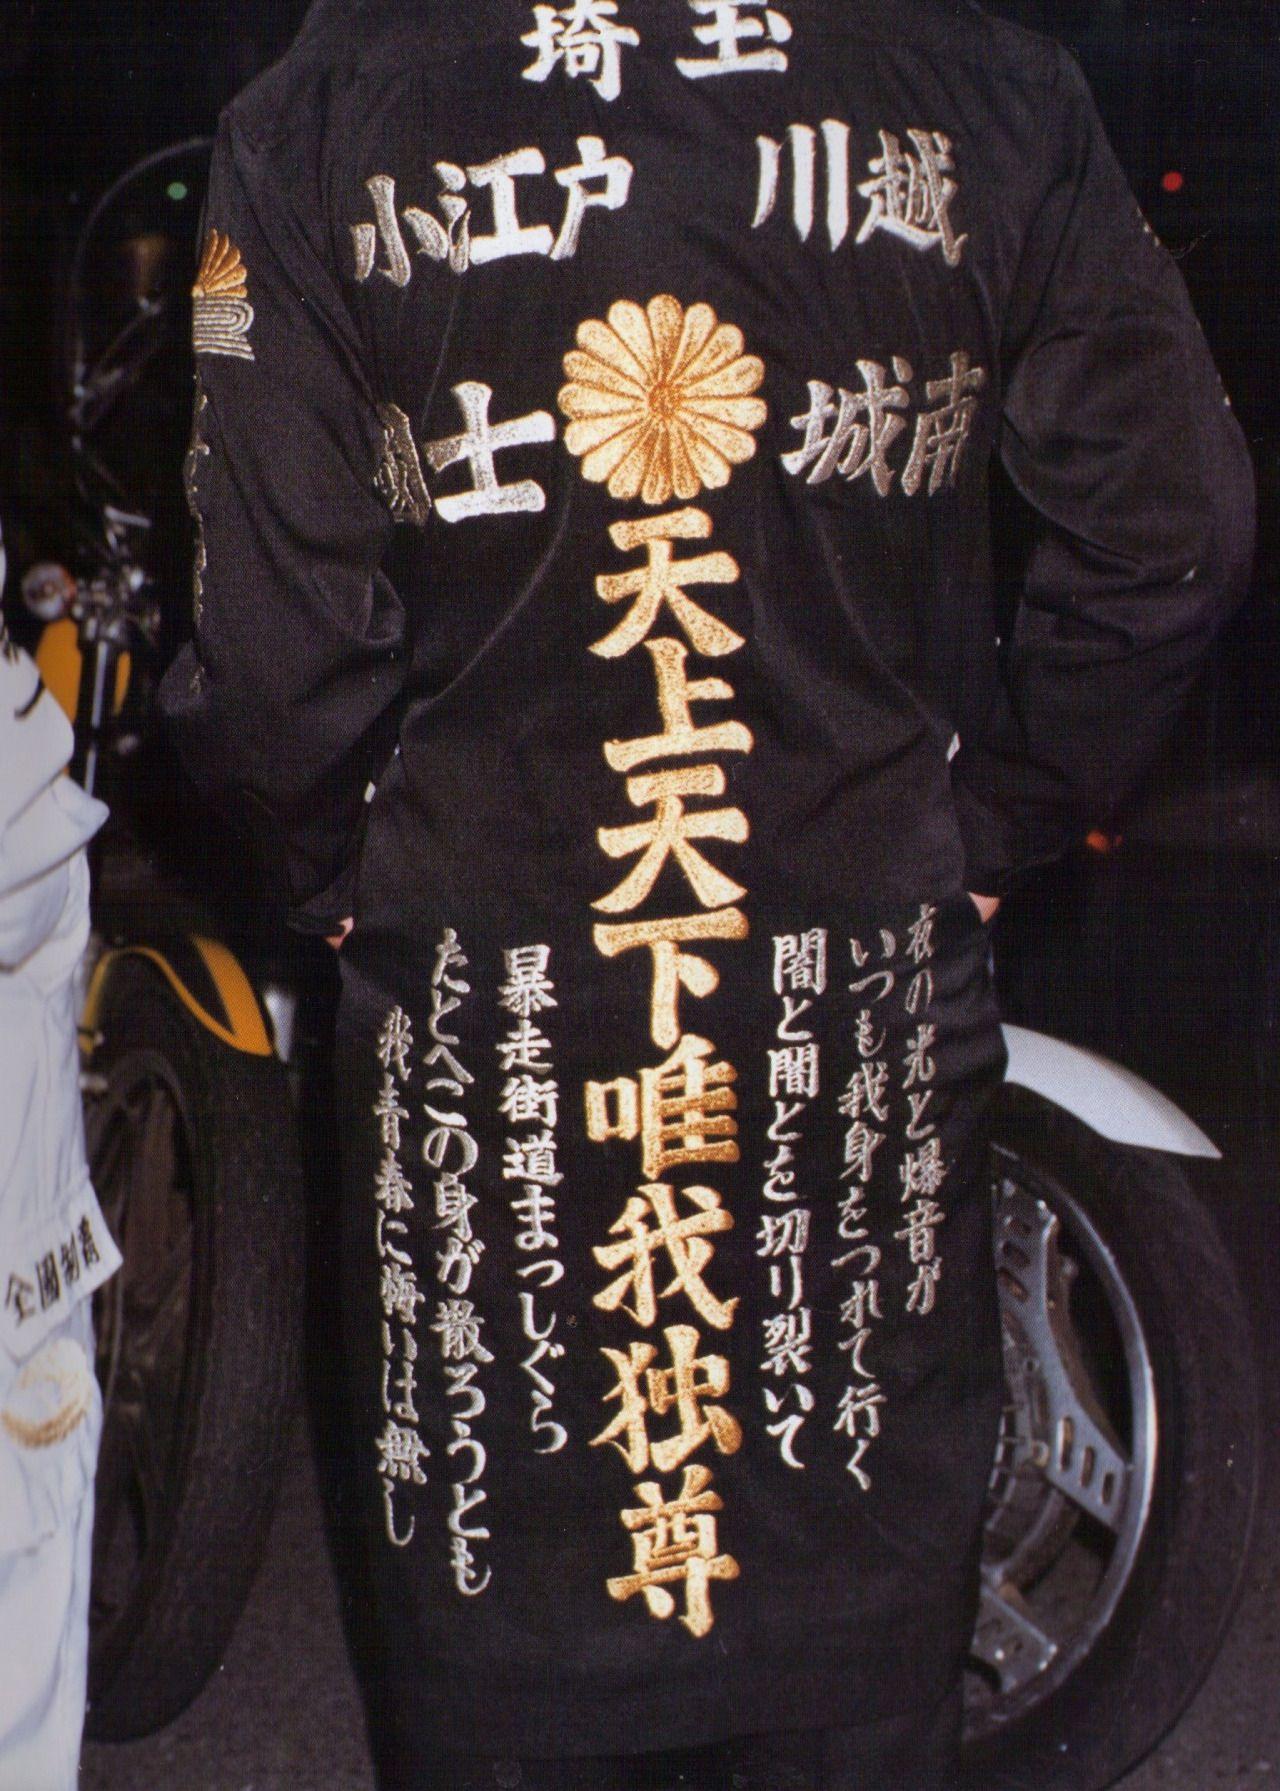 sukeban style bosozoku uniform bosozoku in 2018 pinterest